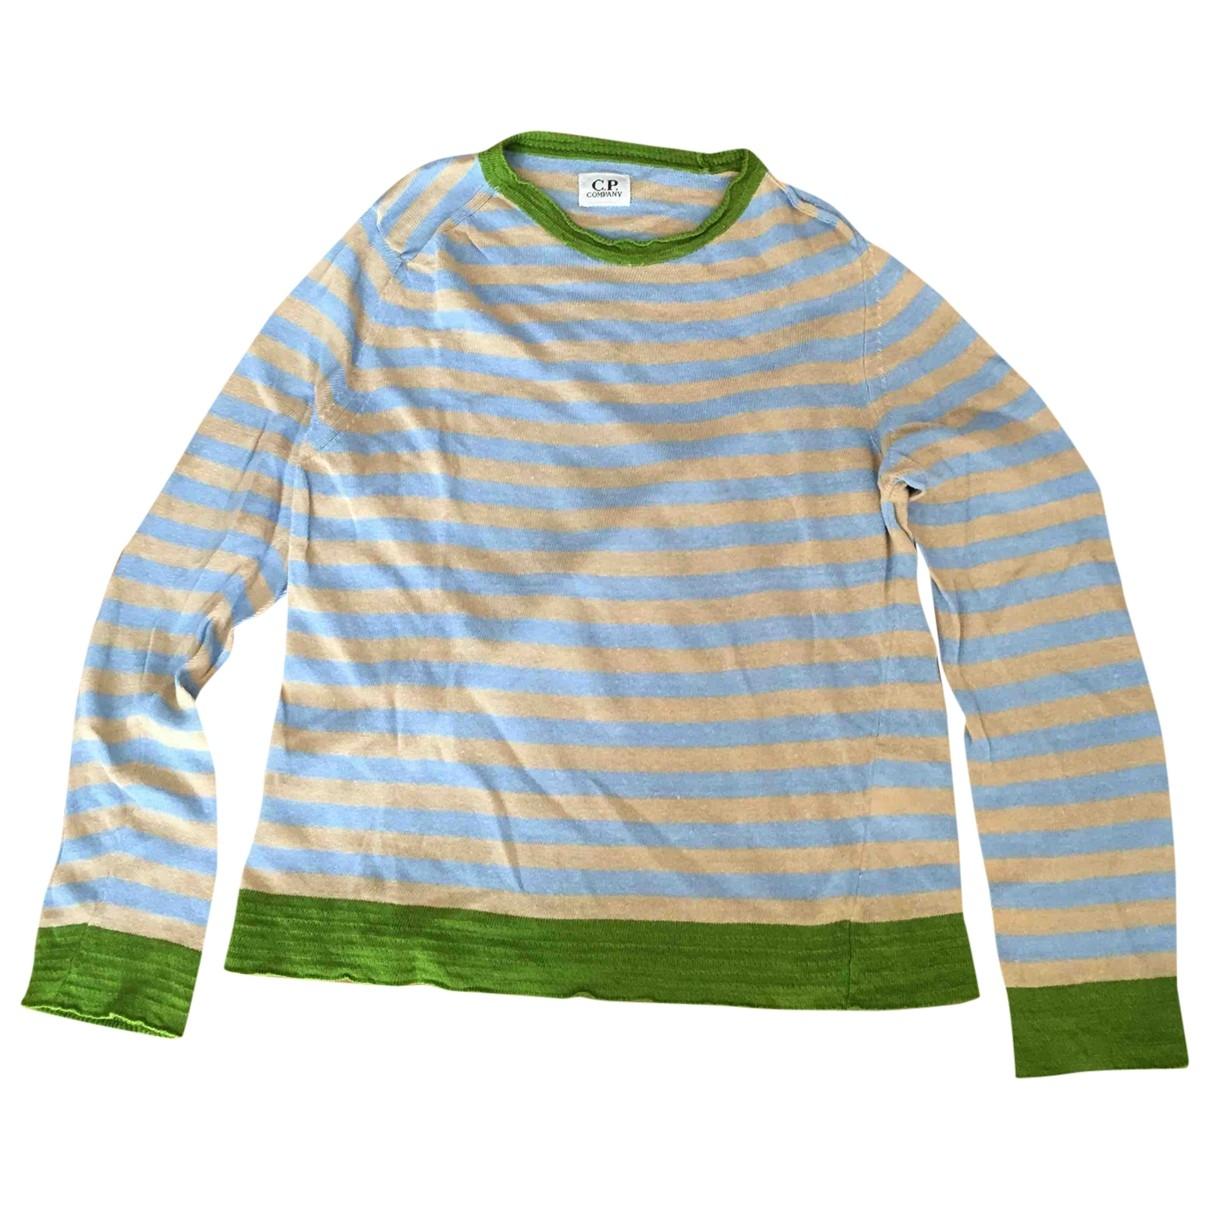 Cp Company - Pull   pour femme en lin - multicolore